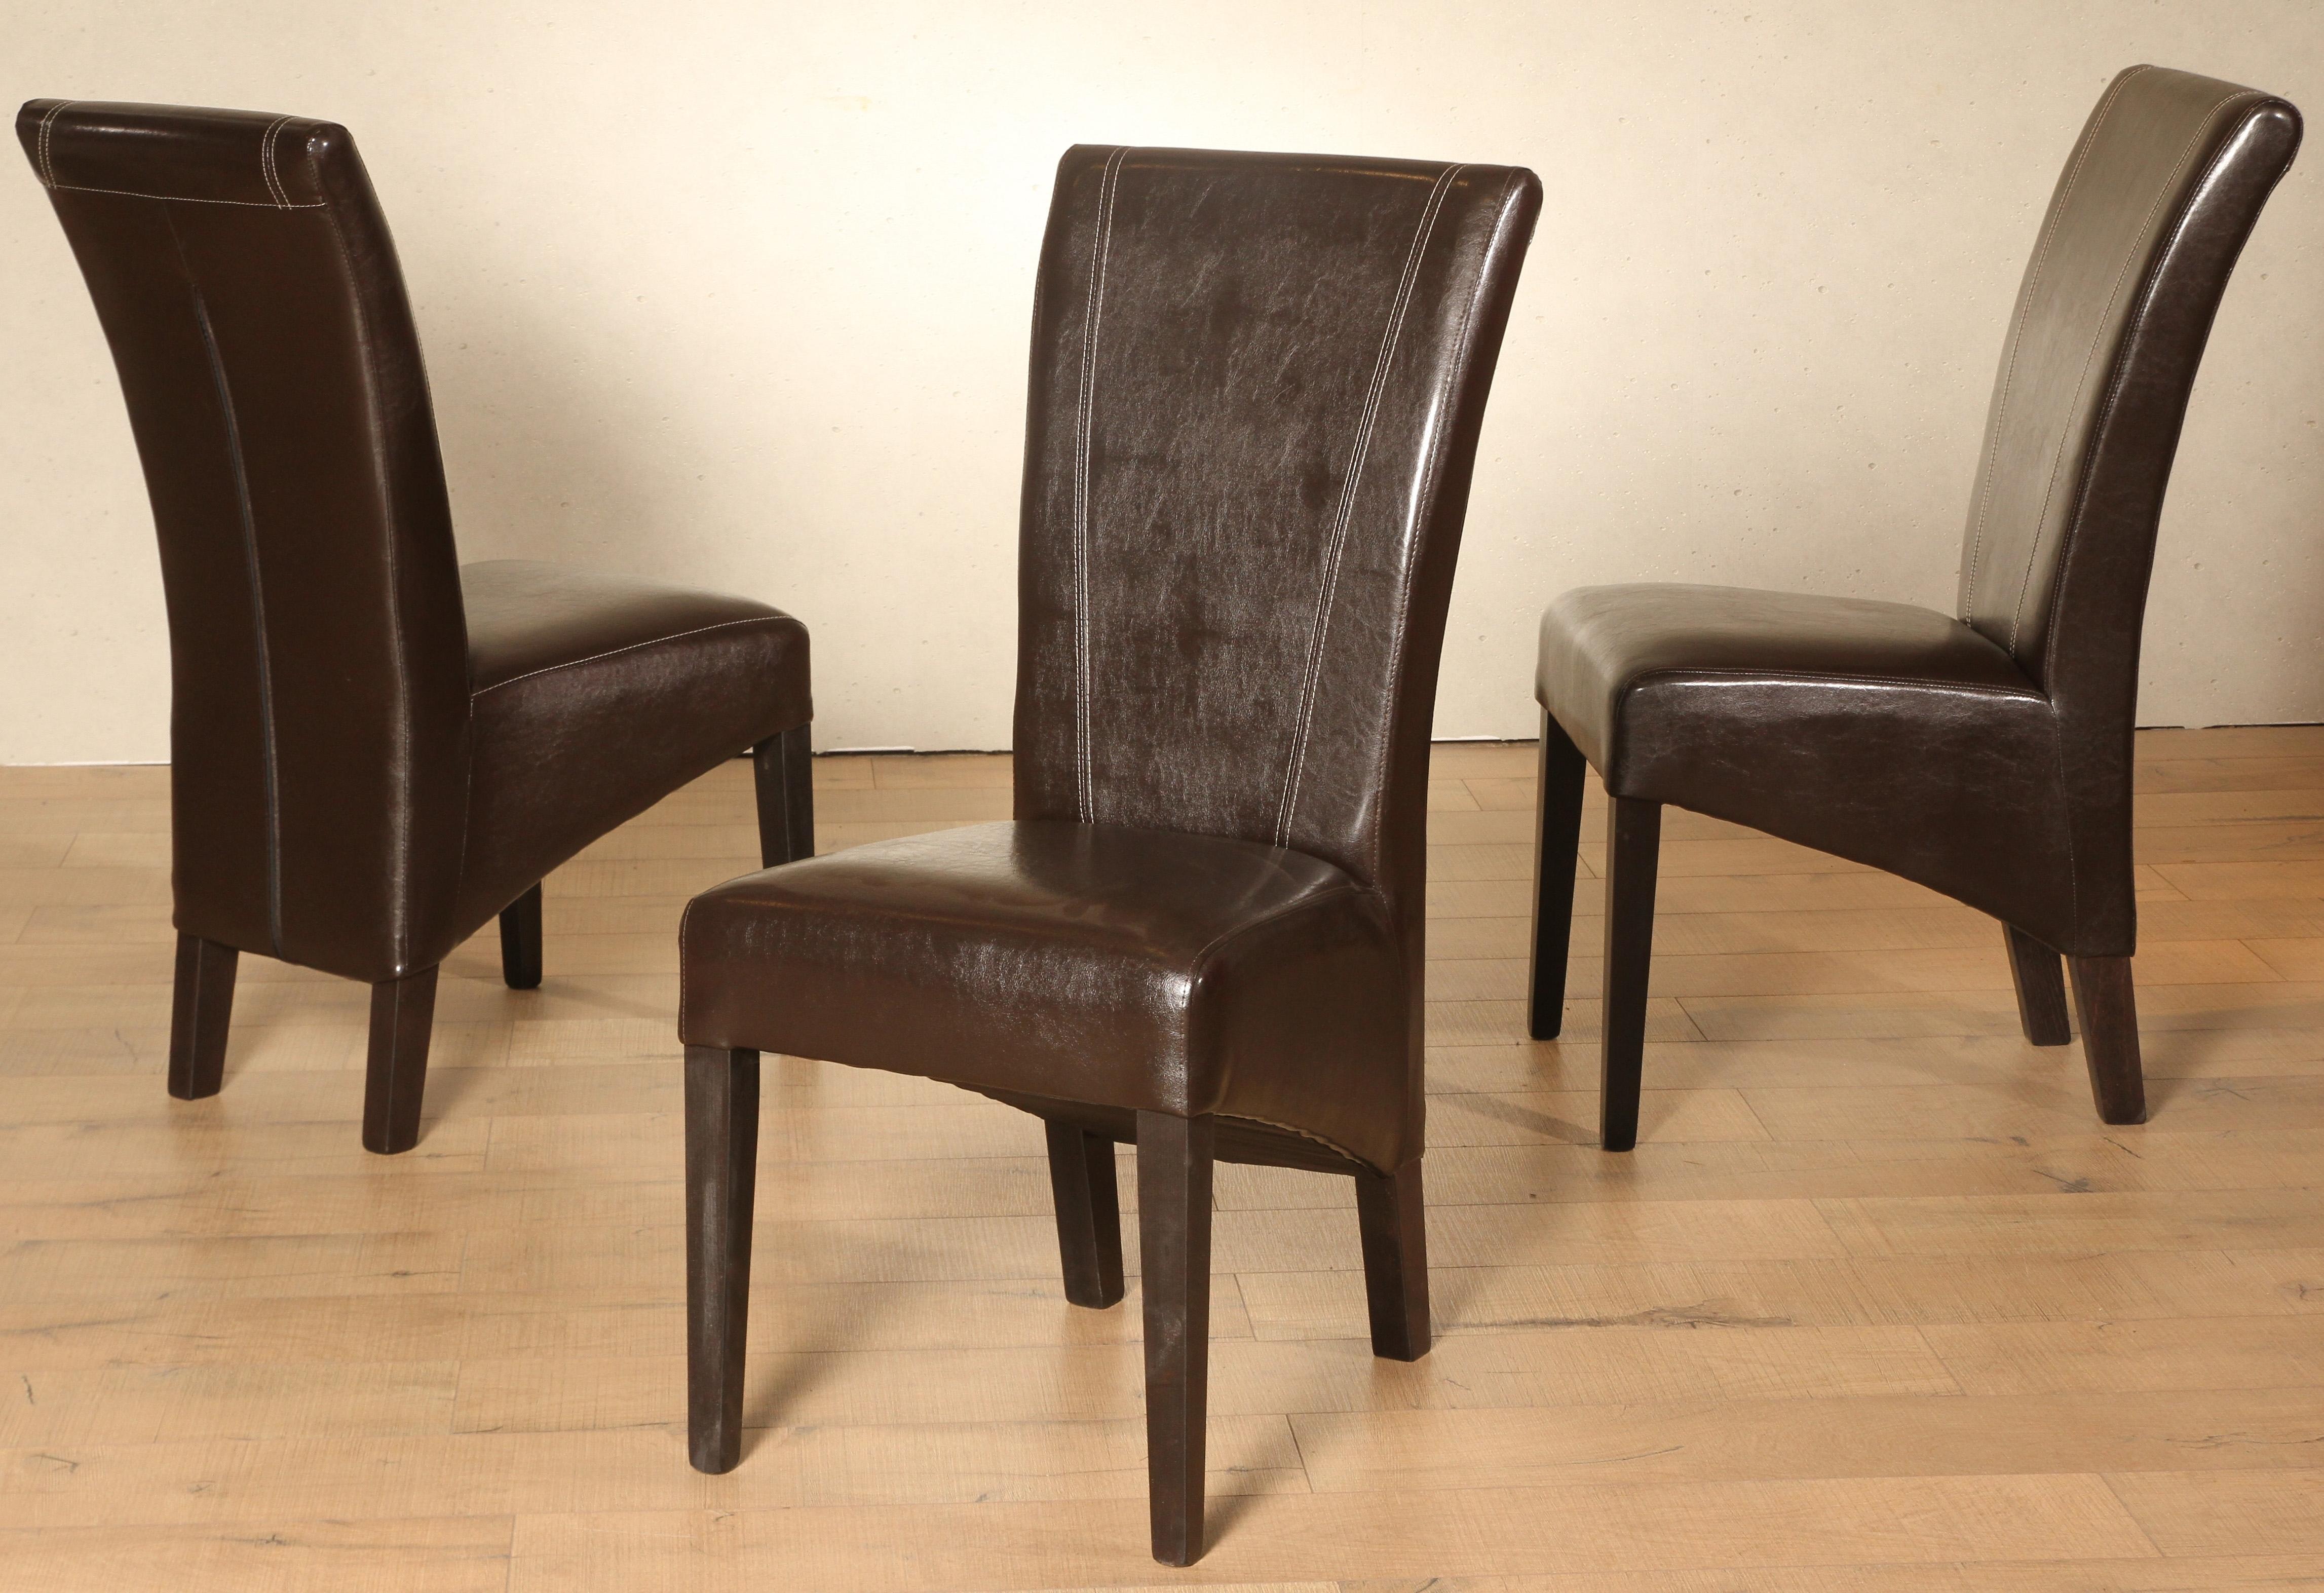 Premium collection by Home affaire stoel Lord (set, 2 stuks) nu online bestellen